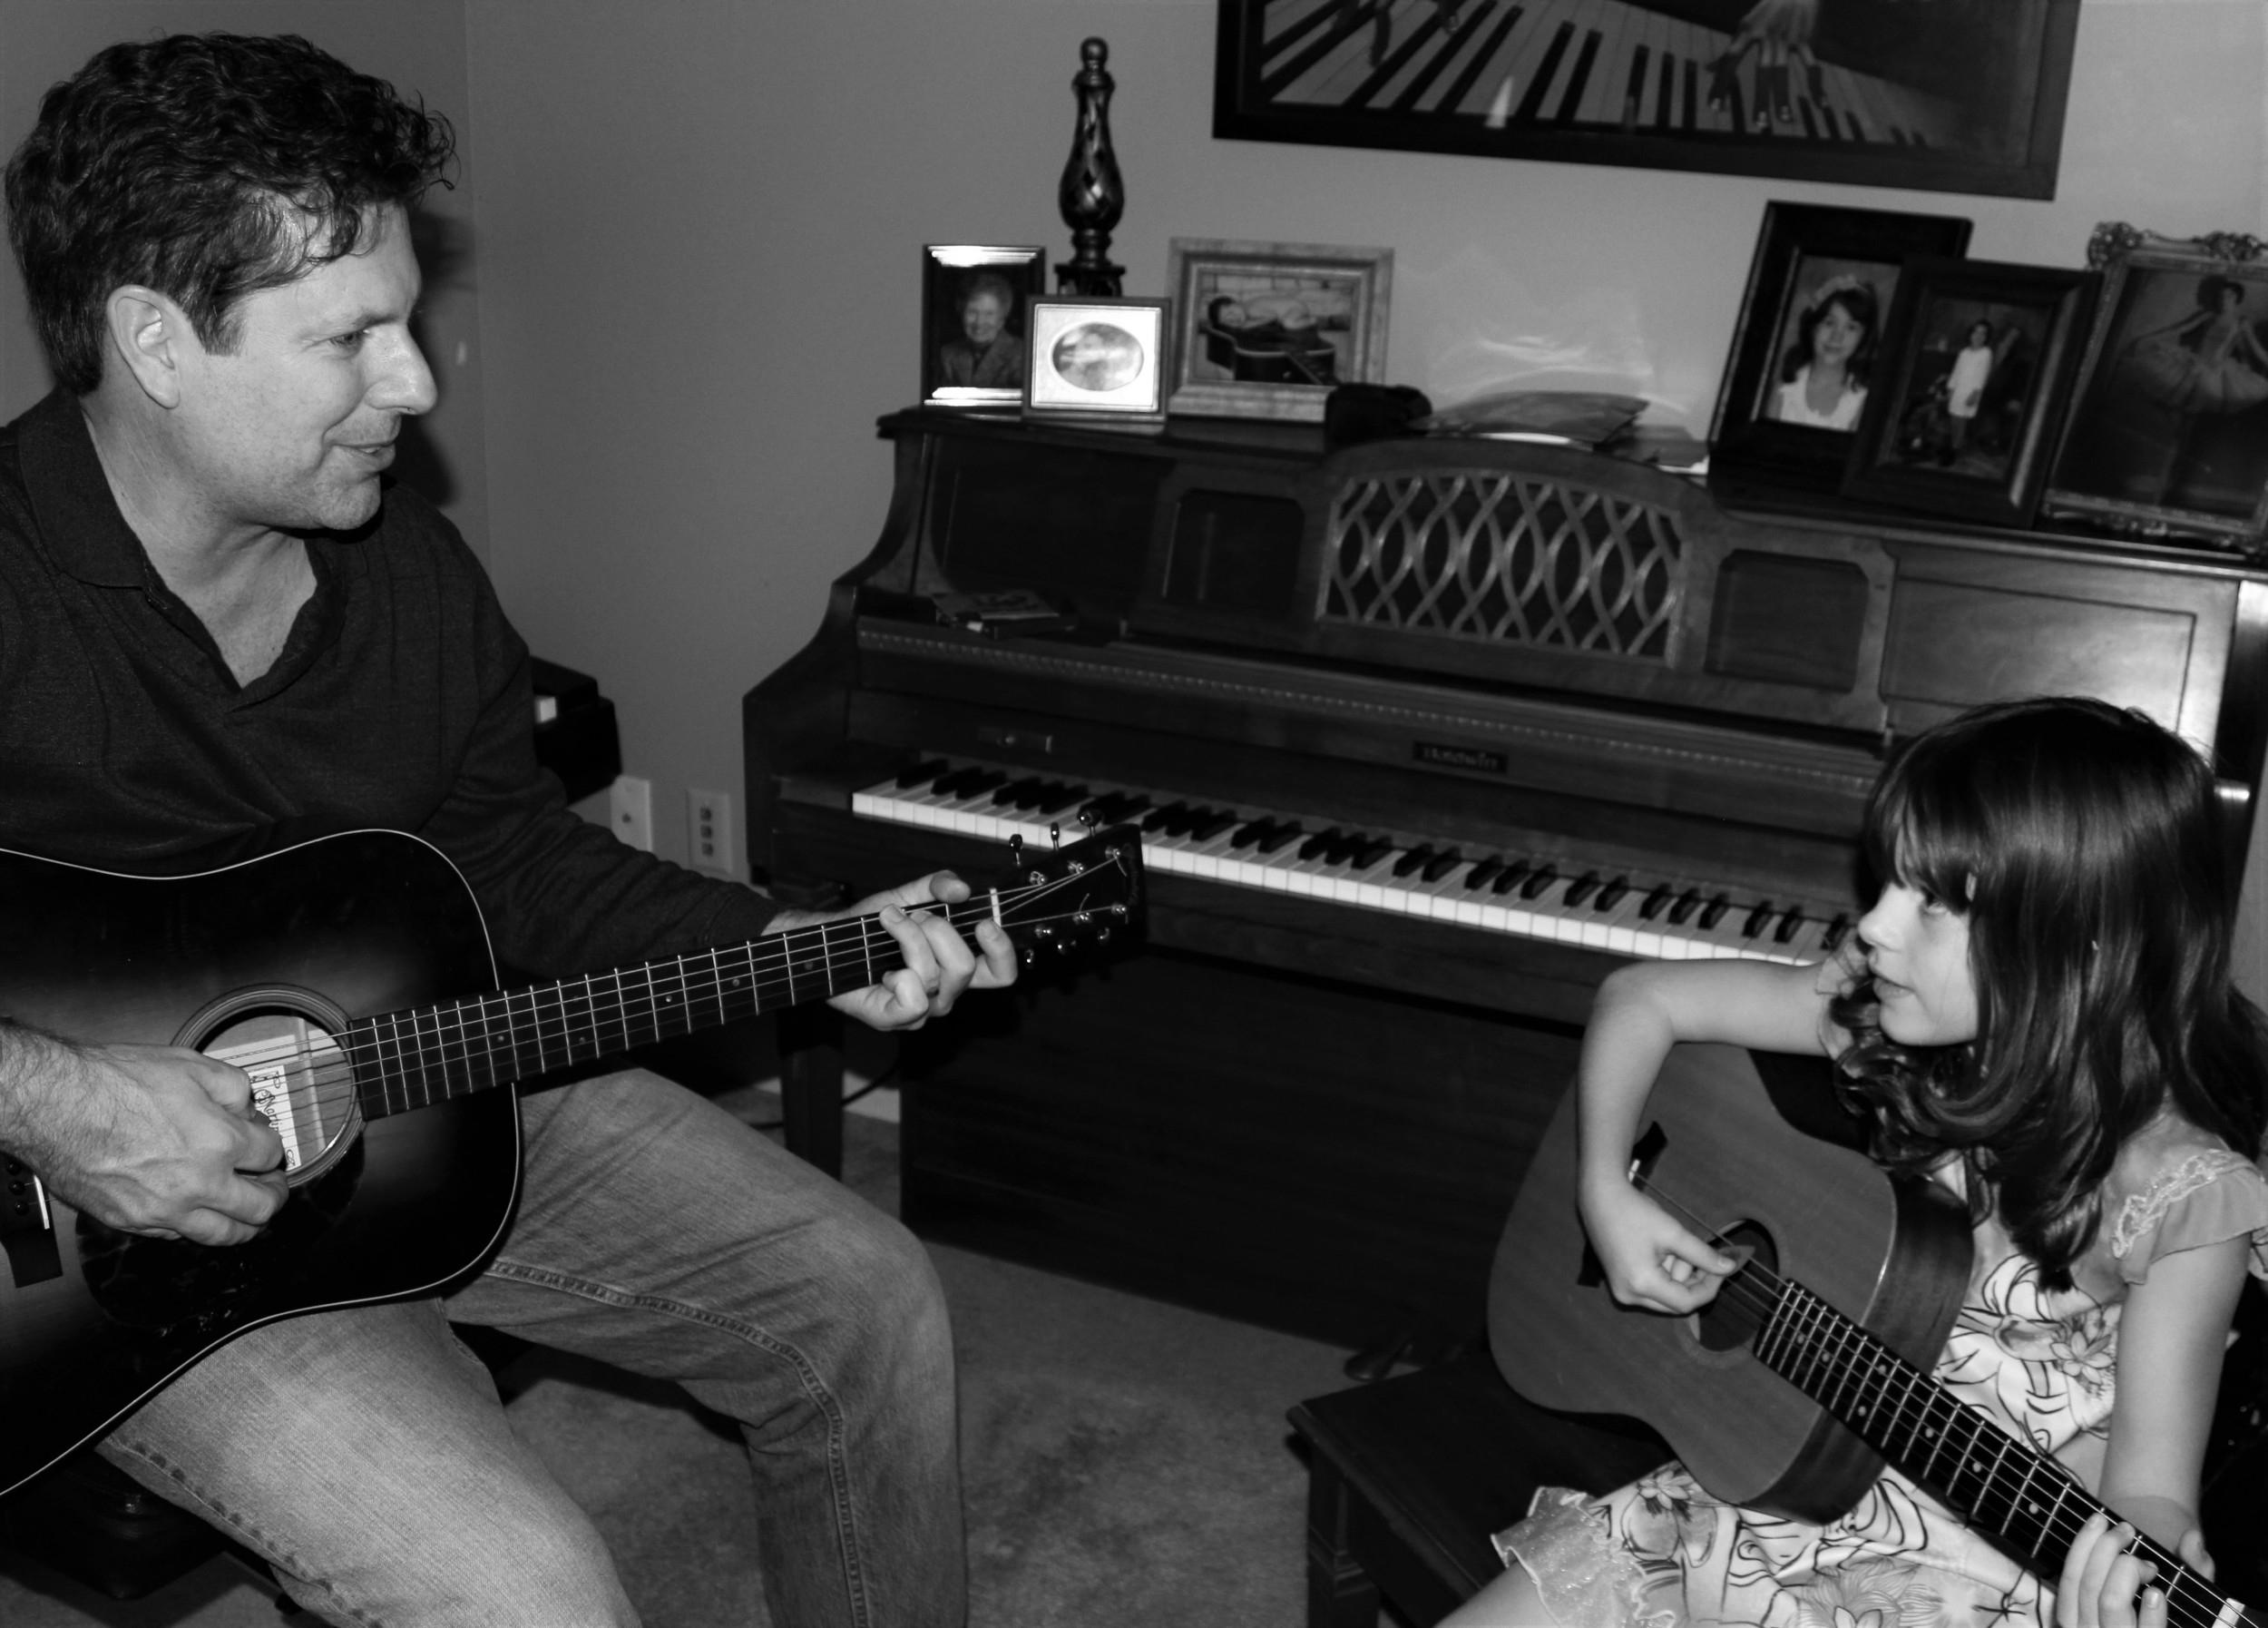 Pickin' with my favorite guitar player - Elsie Wickham